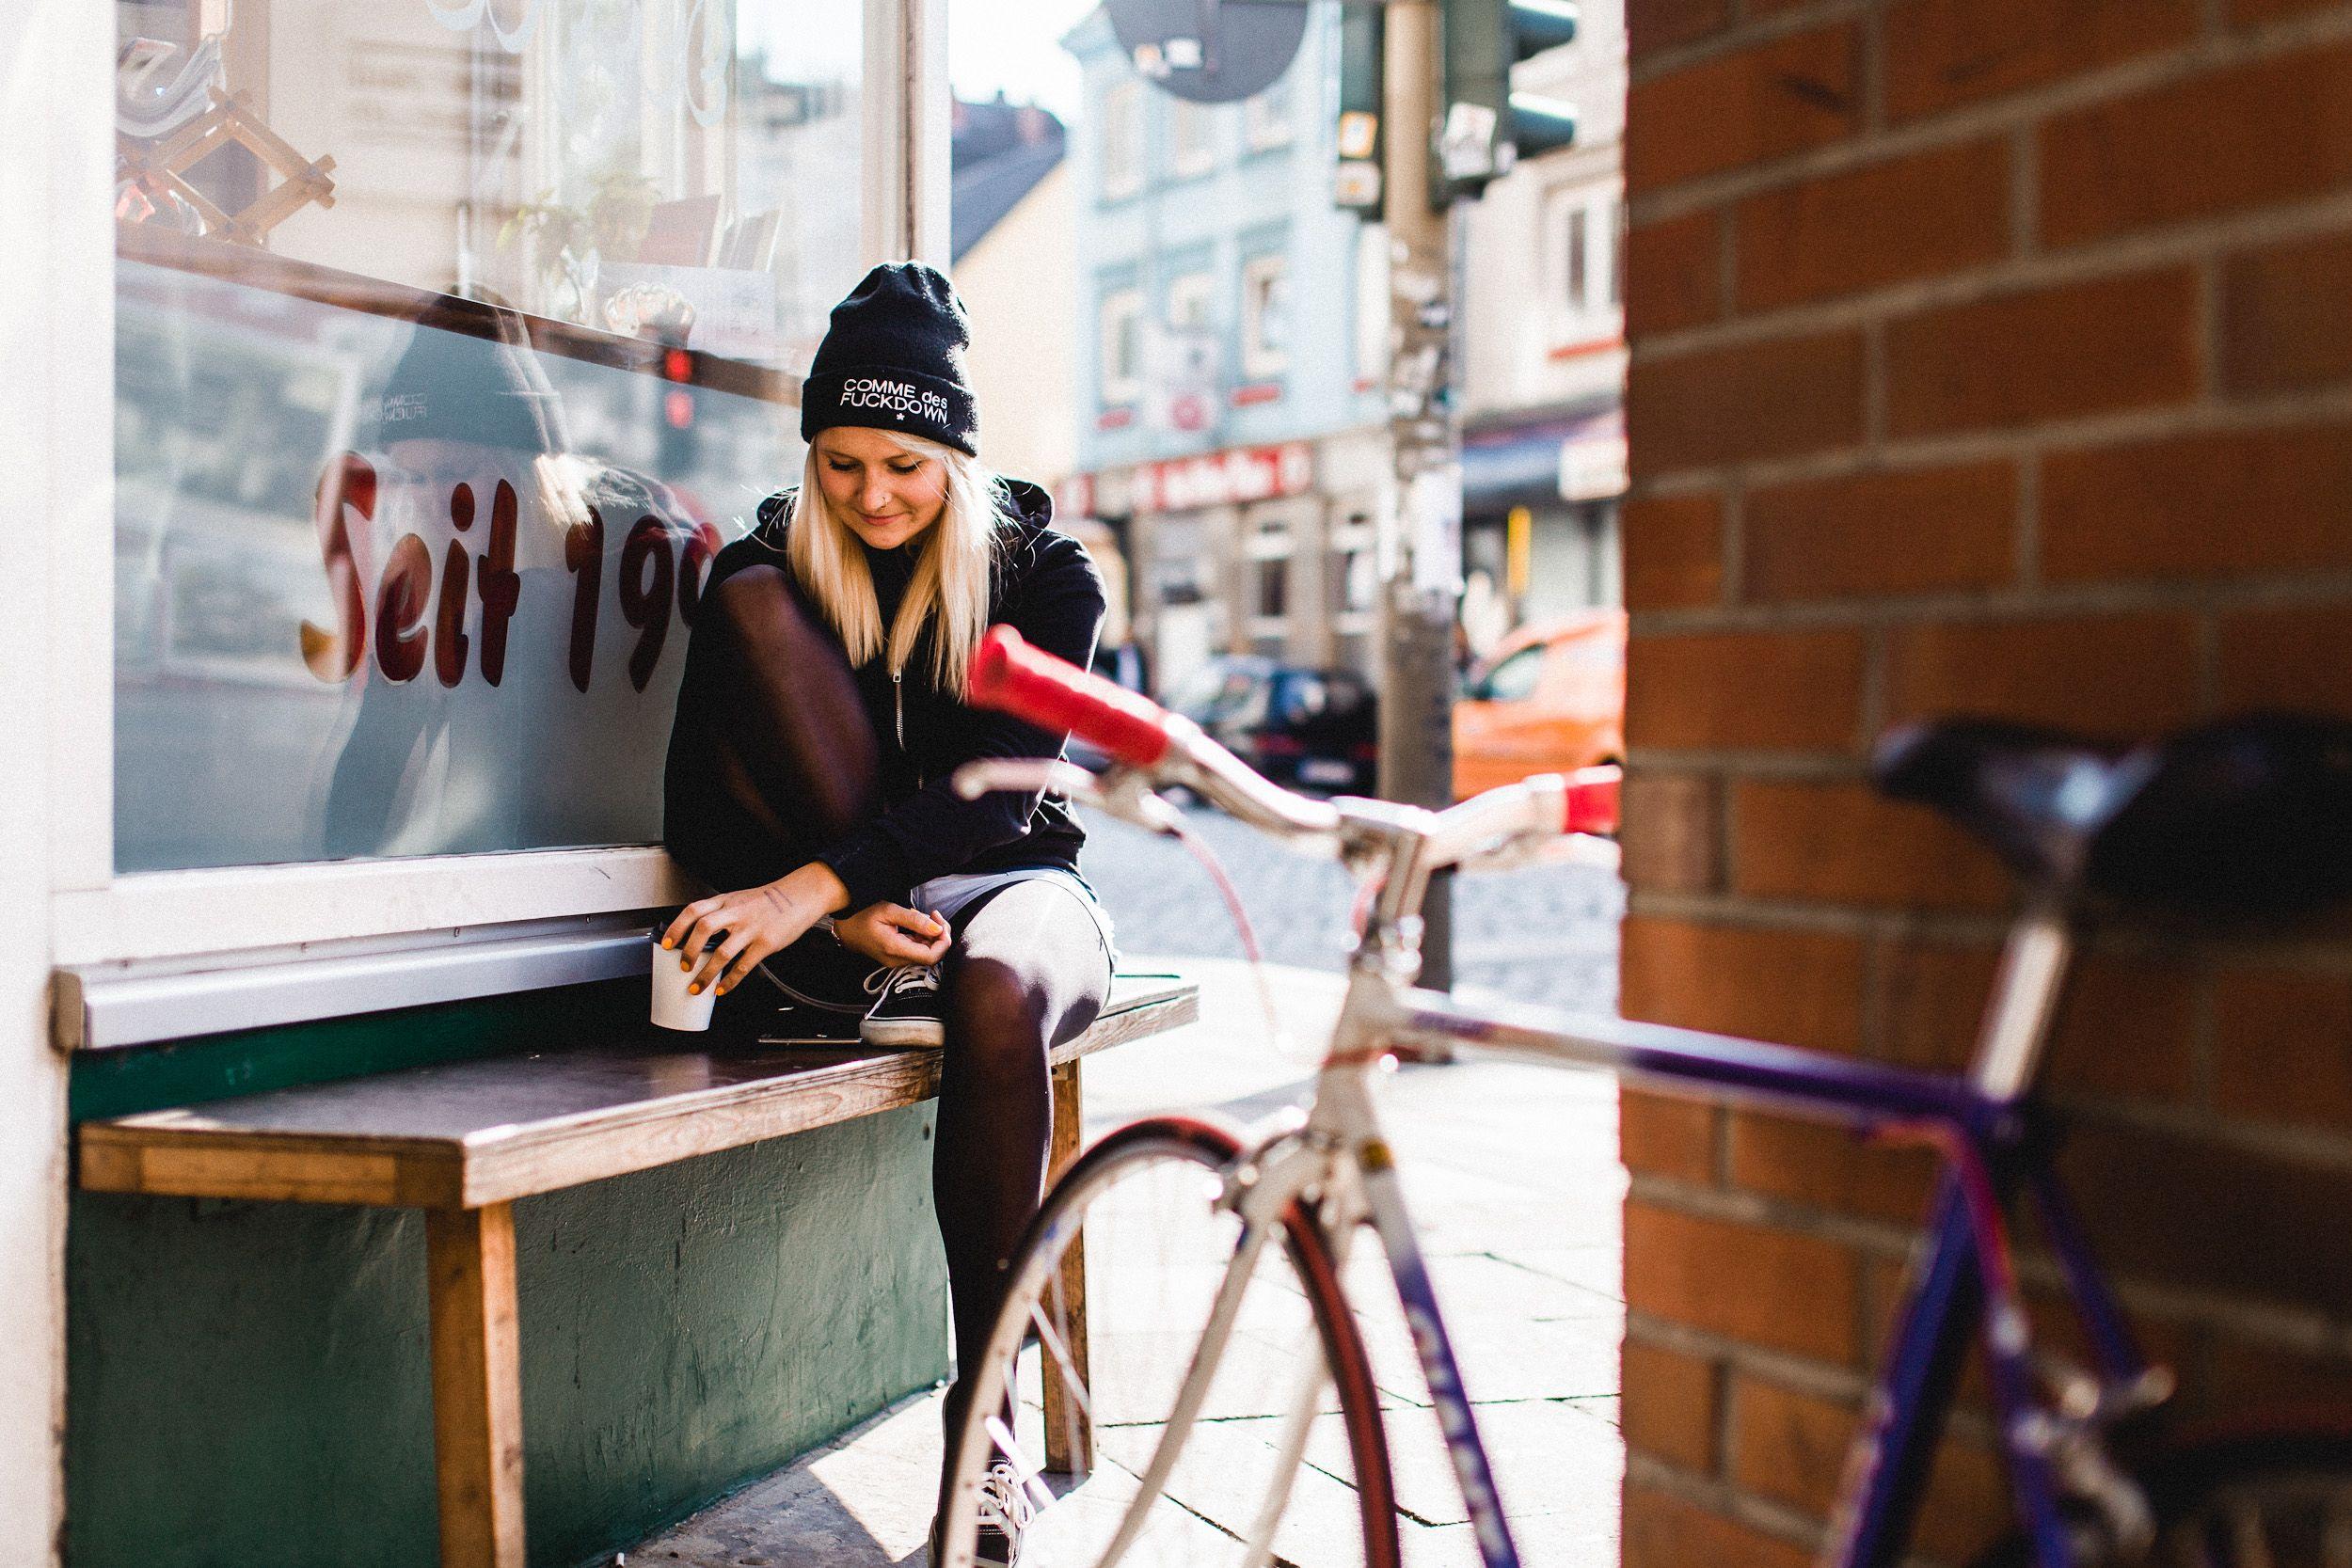 Fixed Gear Girl Taiwan We Are Traffic Fixed Gear Girl Bicycle